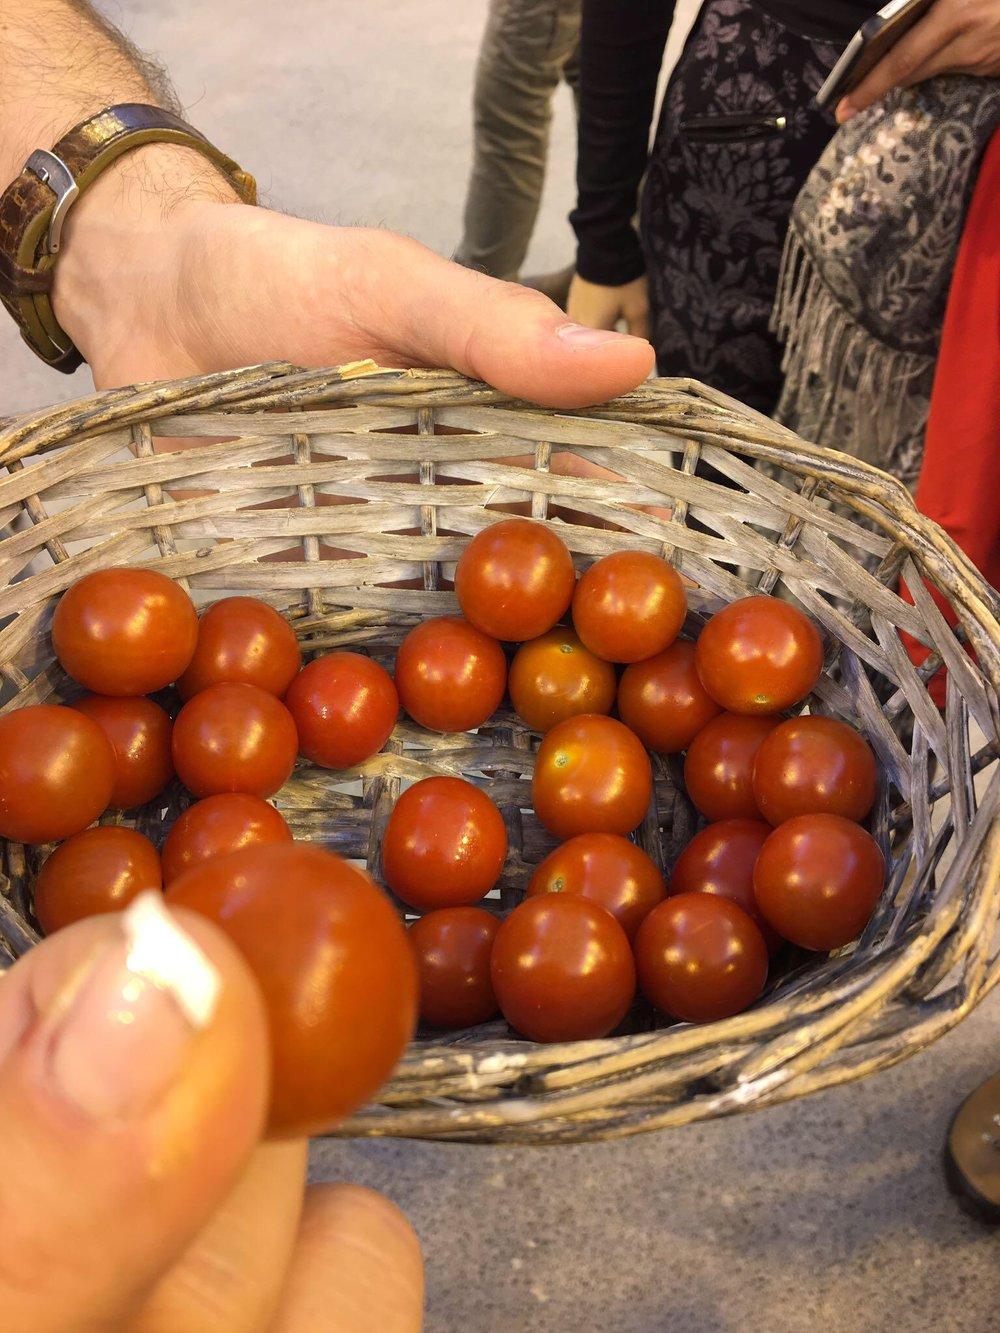 fridheimar tomatoes iceland.JPG